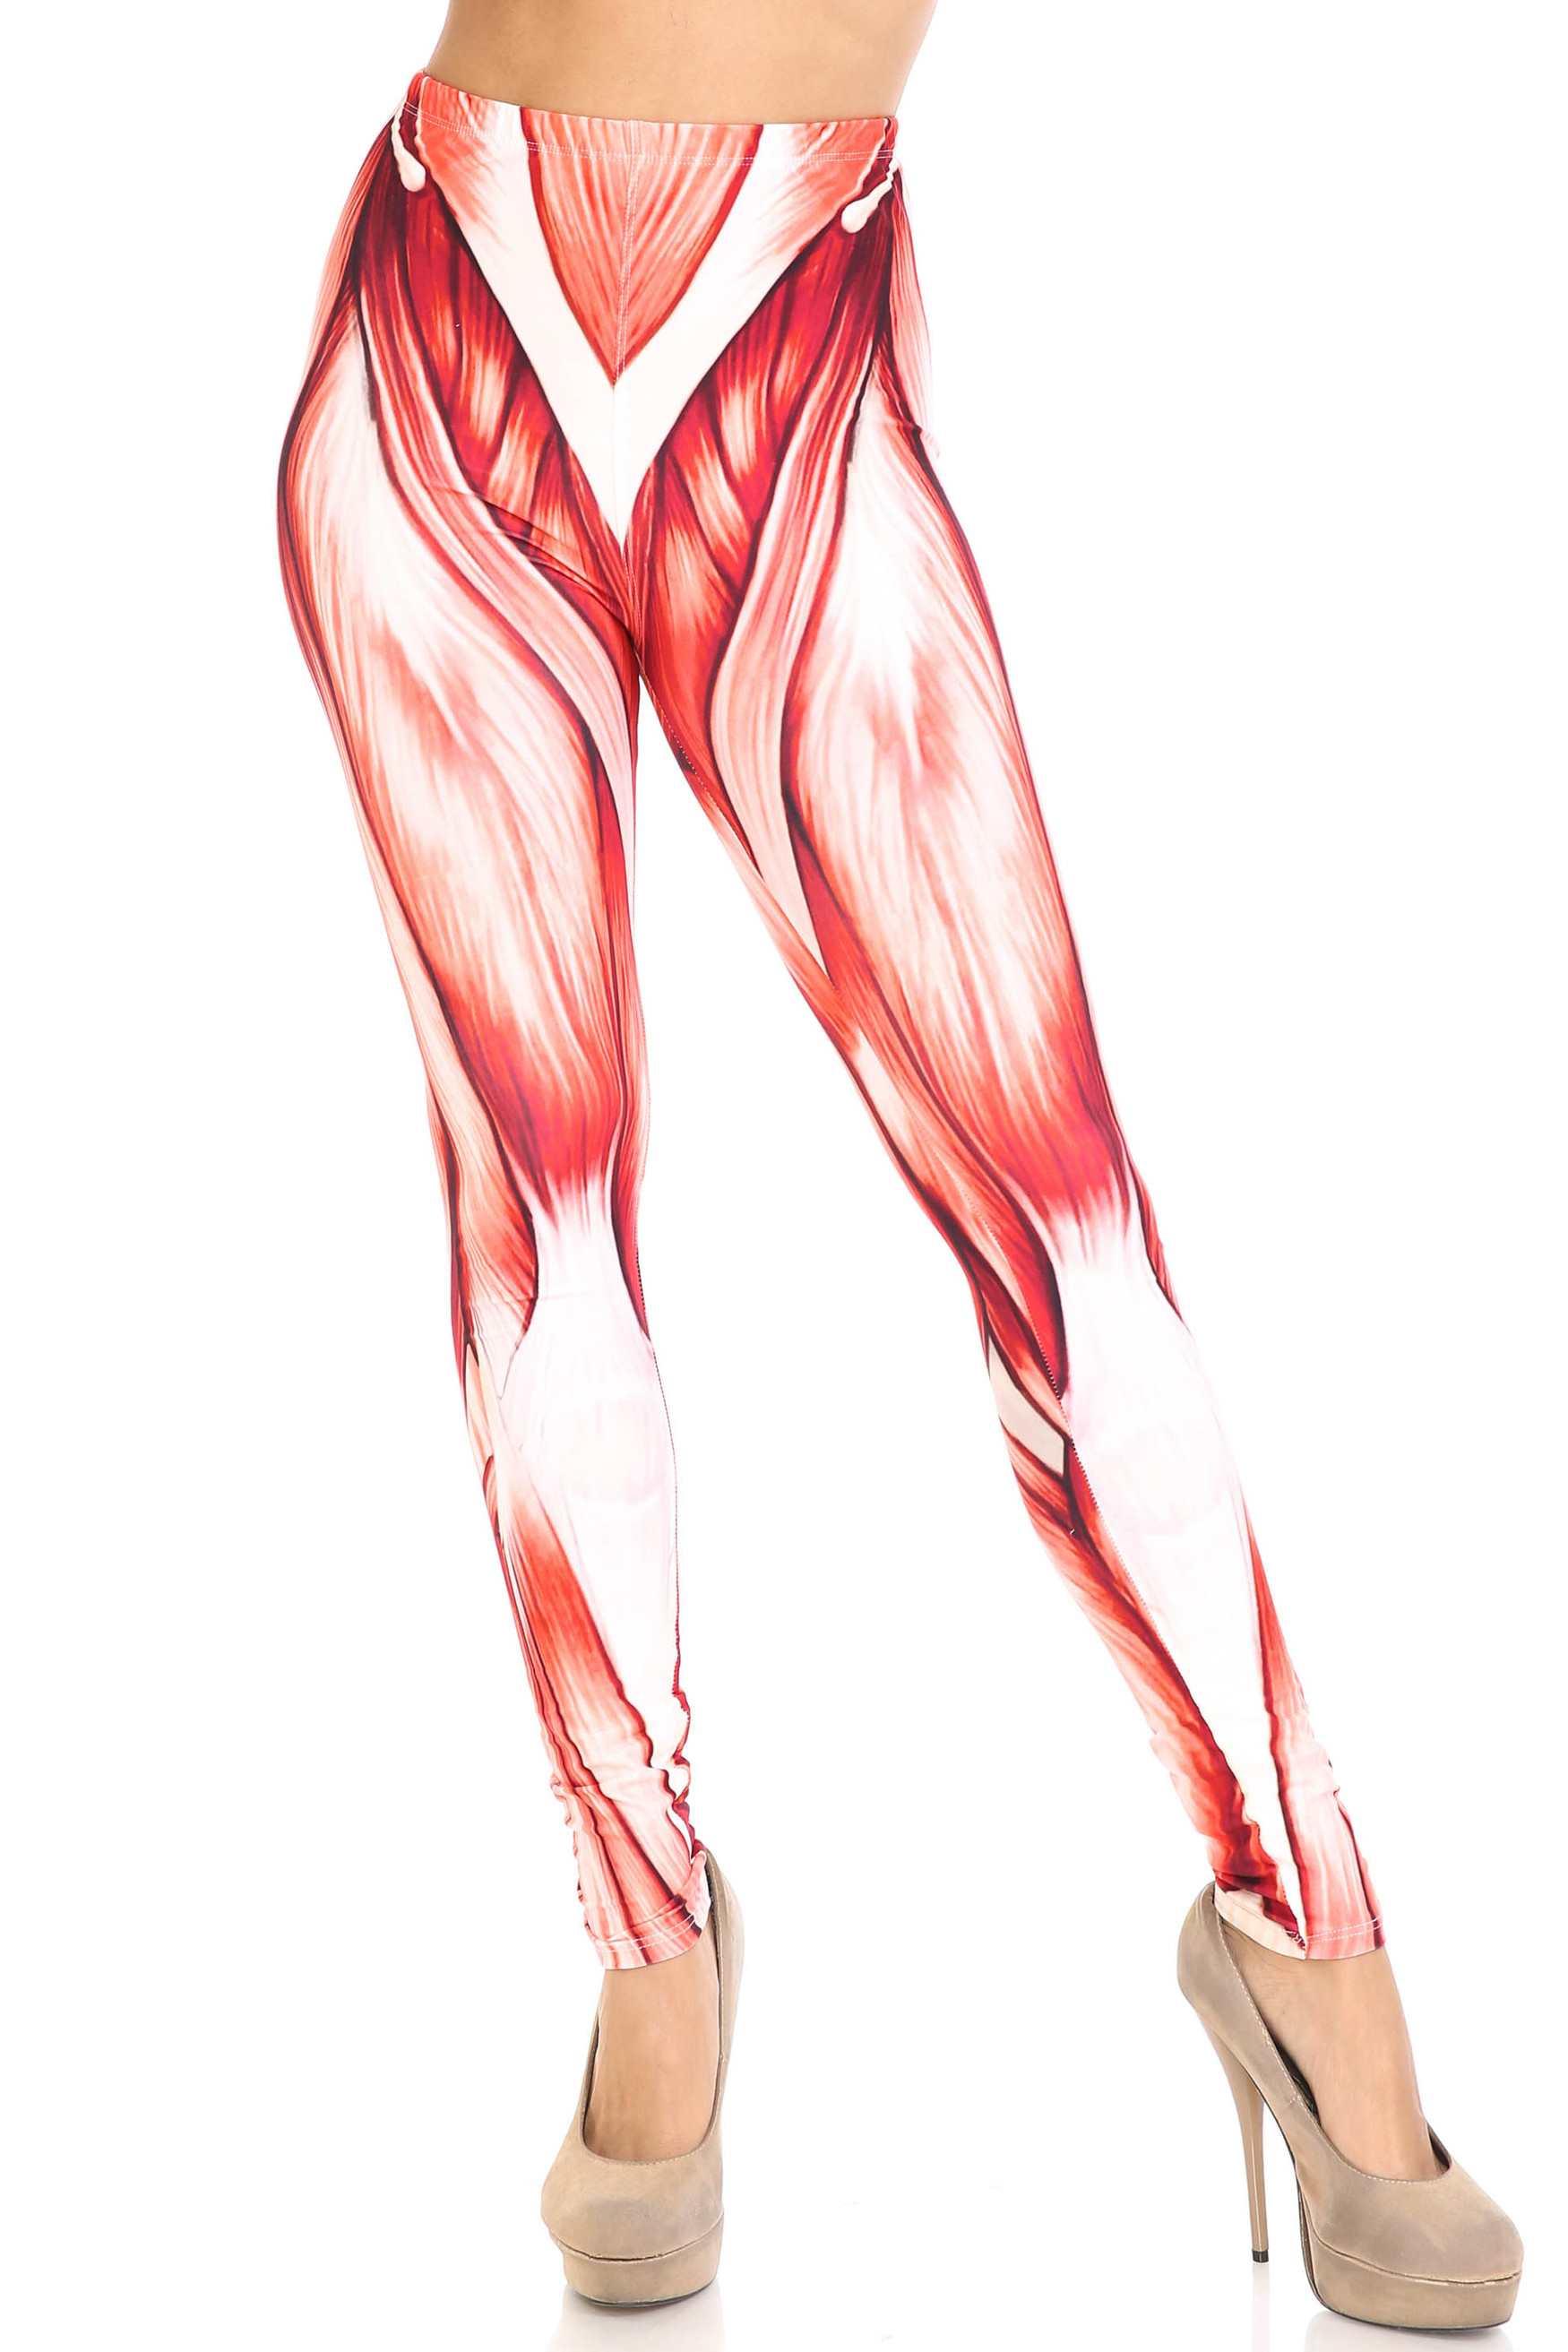 Creamy Soft Muscle Plus Size Leggings - By USA Fashion™